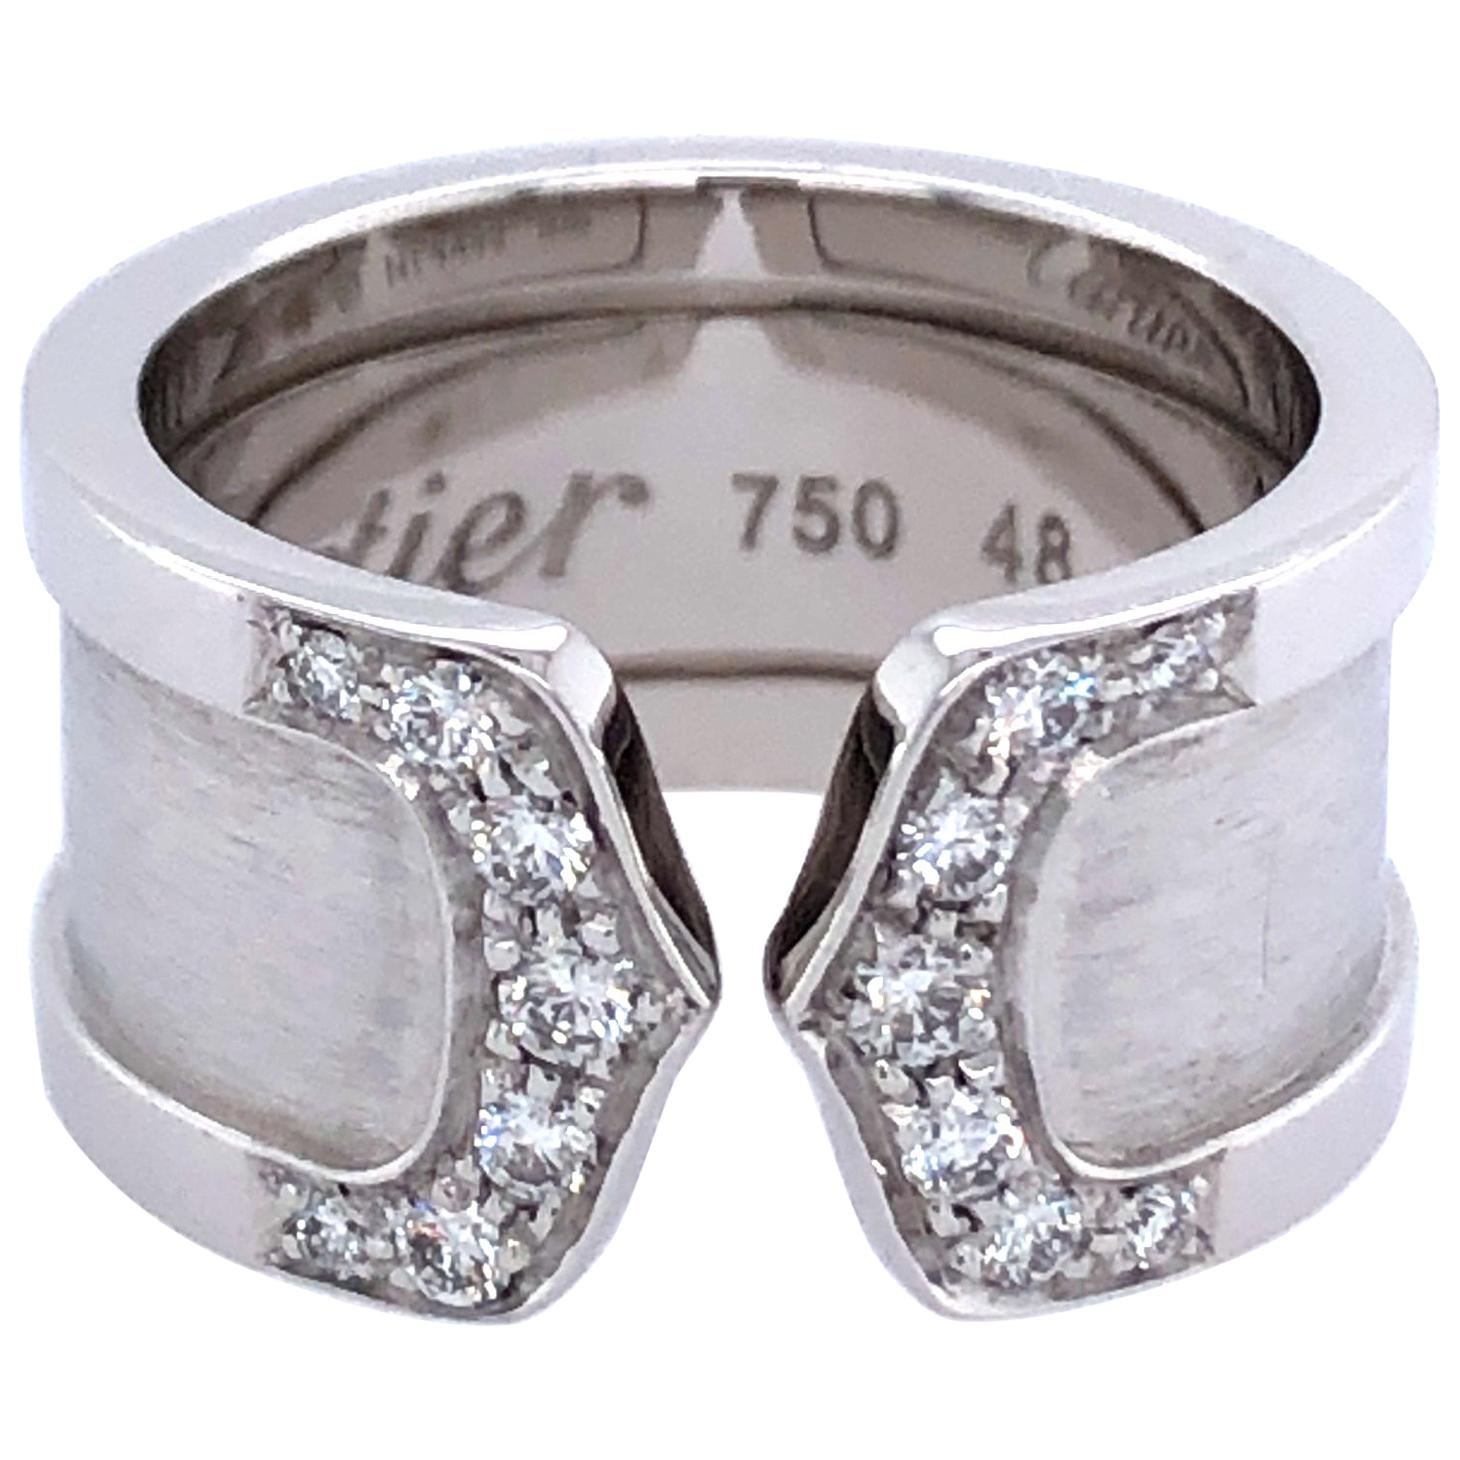 Cartier 18 Karat White Gold Diamond Double C Ring